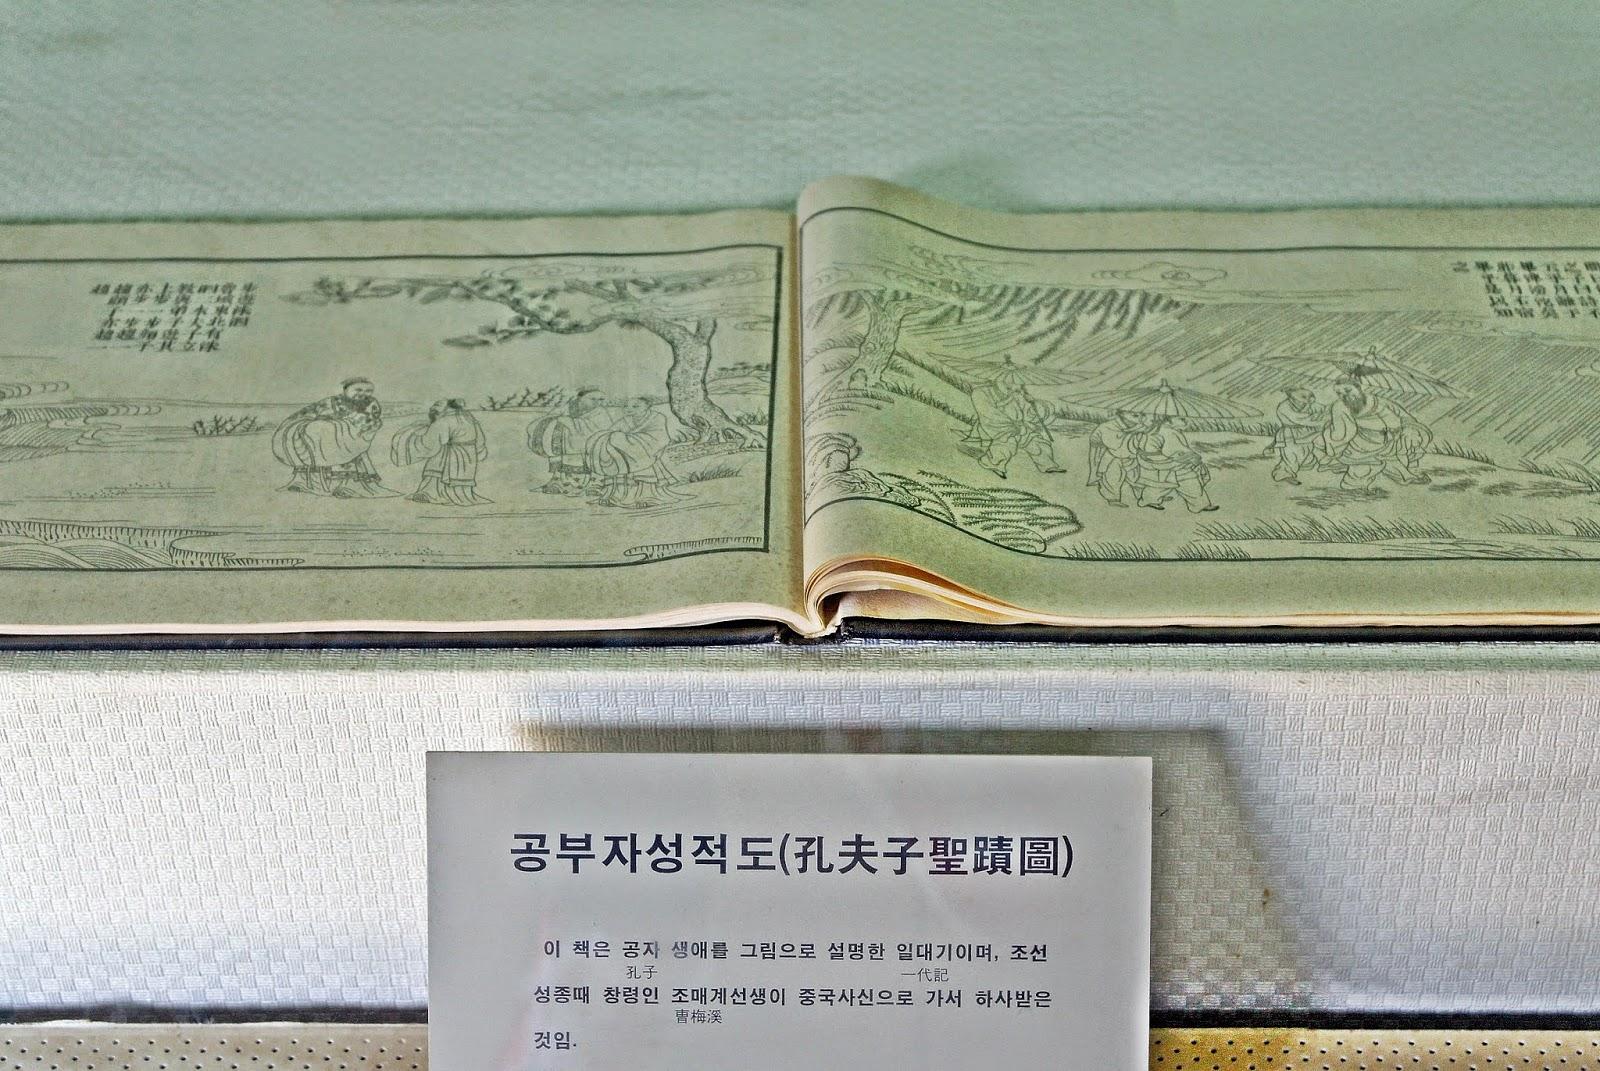 Yeongju Sosuseowon Confucian Academy 영주 소수서원 | meheartsoul.blogspot.com